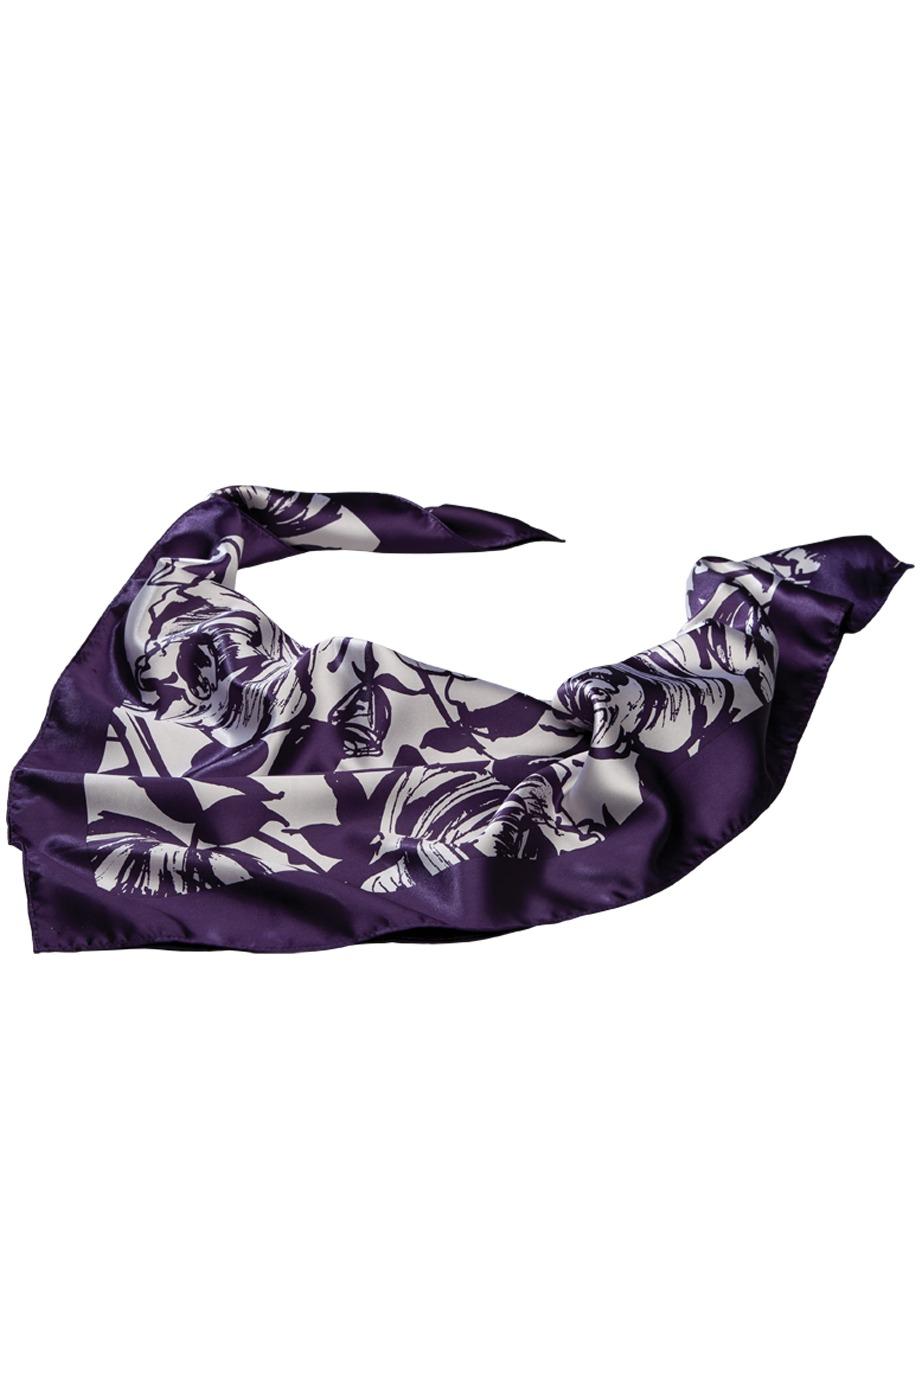 Edwards Garment SC52 - Floral Scarf